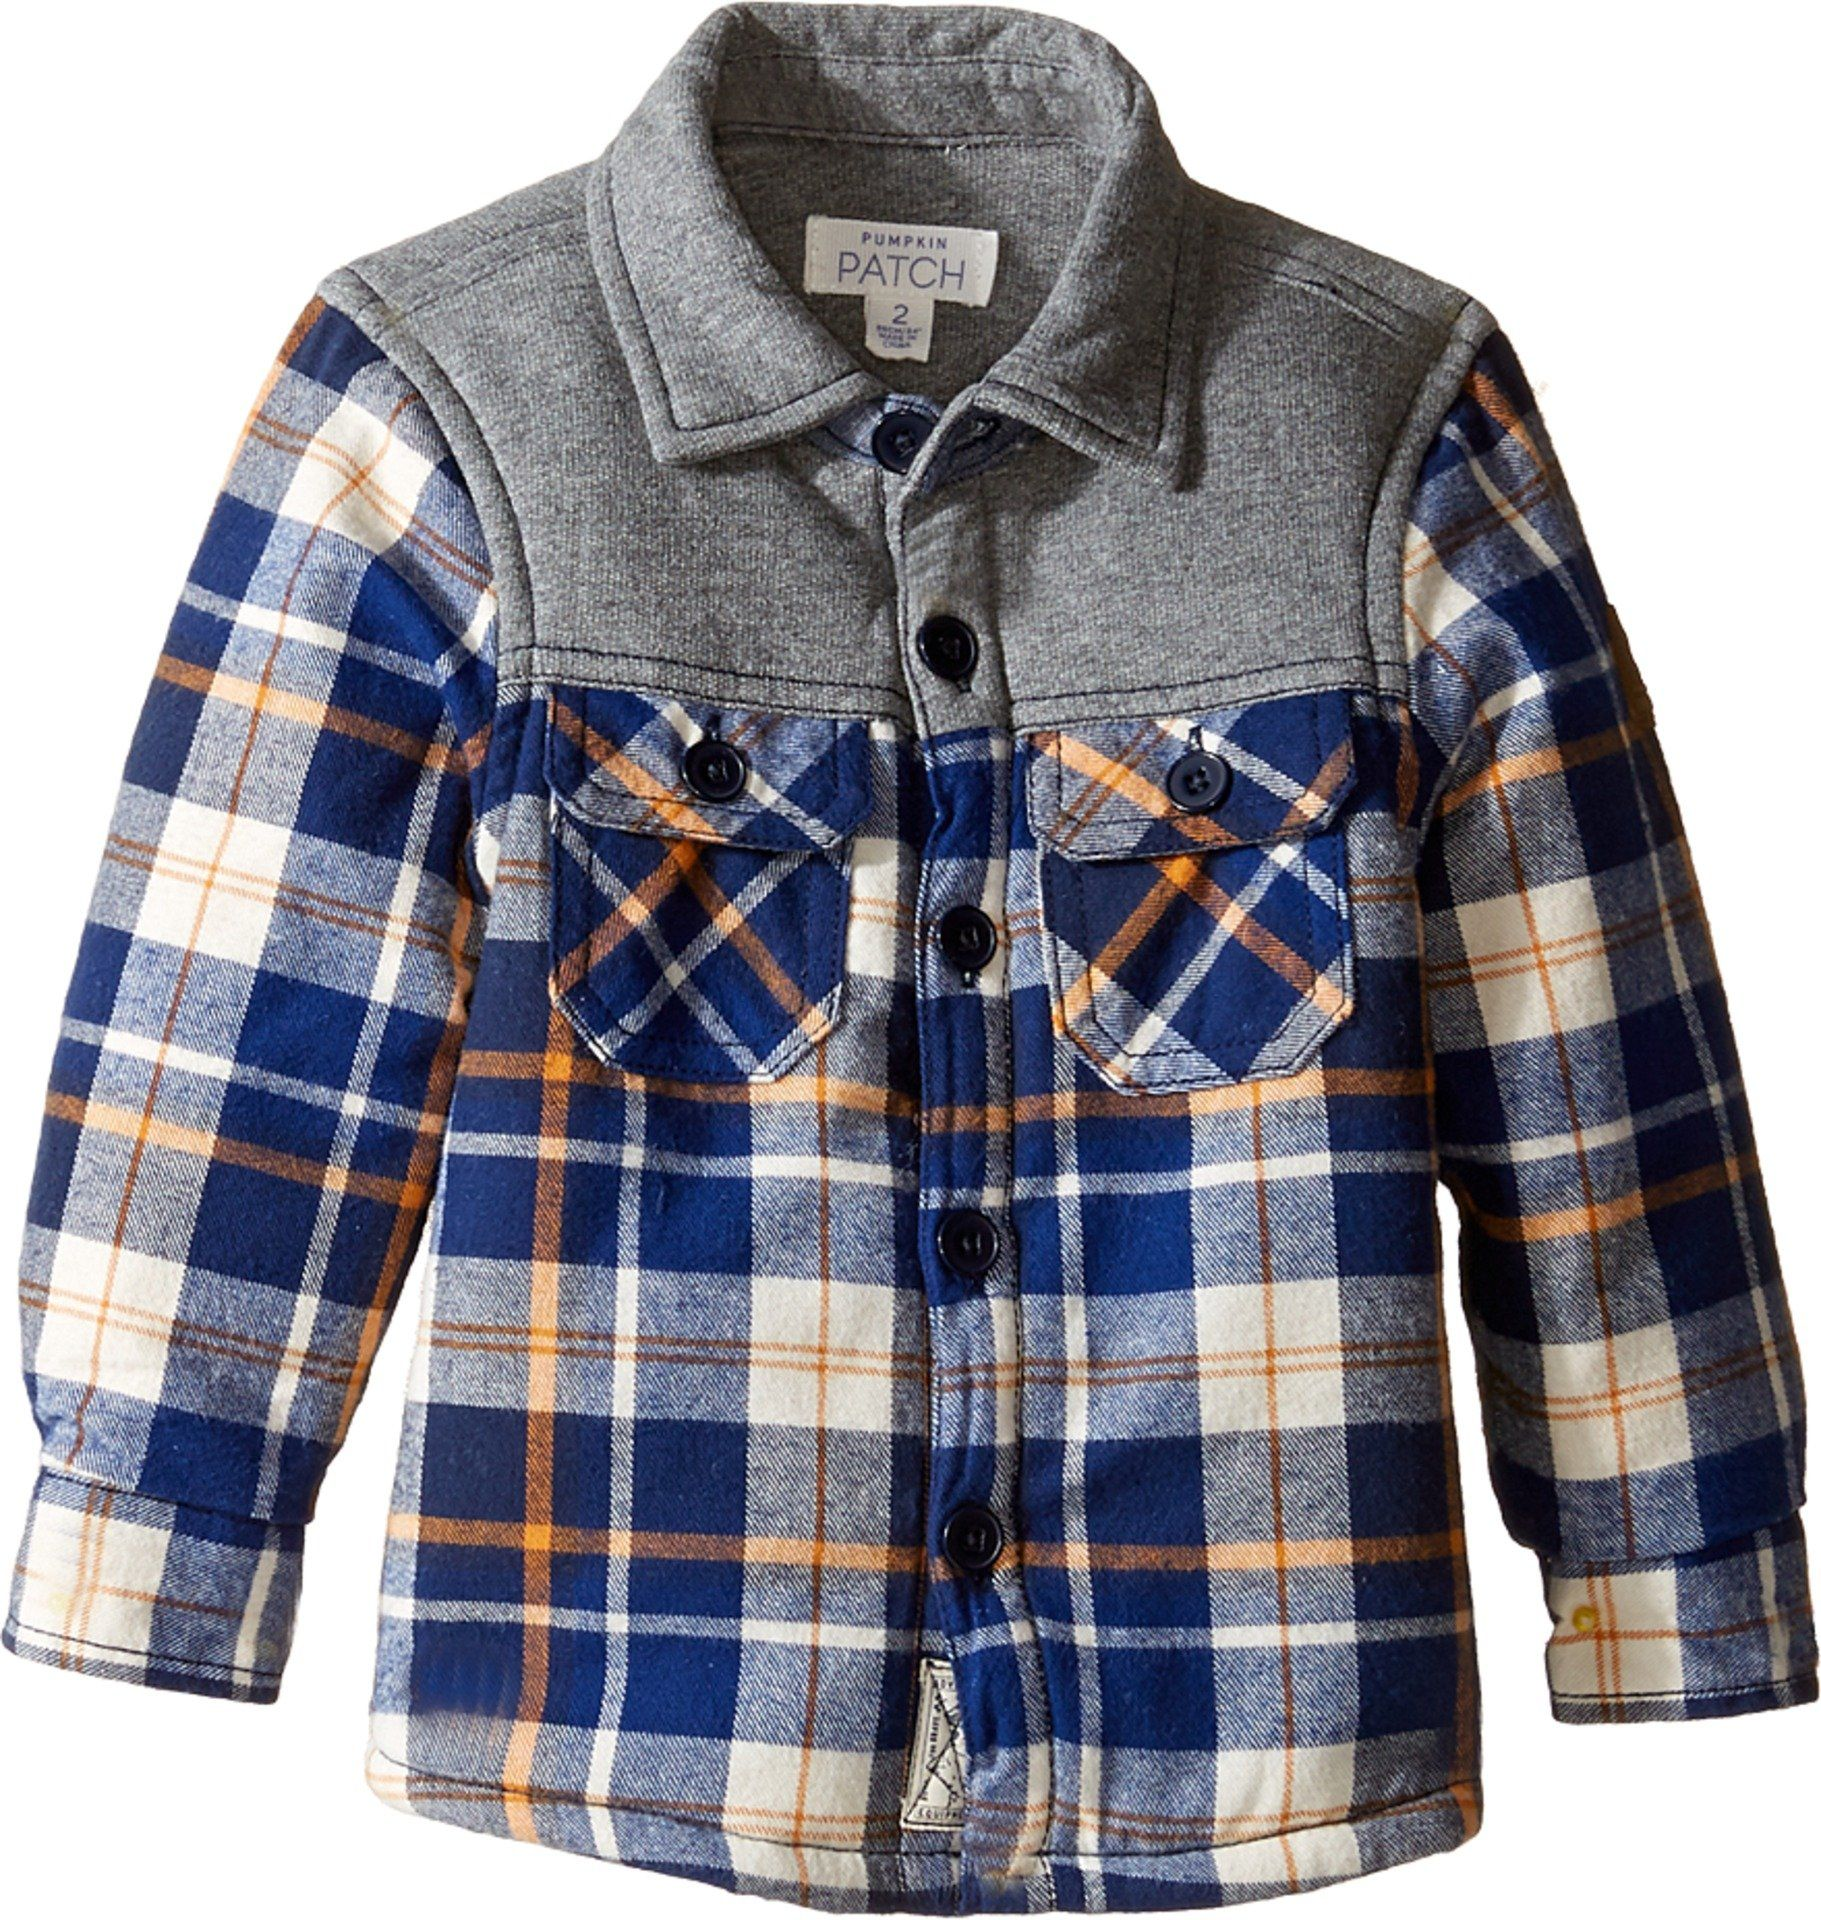 45a8baf9 Pumpkin Patch Kids Baby Boy's Spliced Check Shirt Jacket (Infant/Toddler/Little  Kids